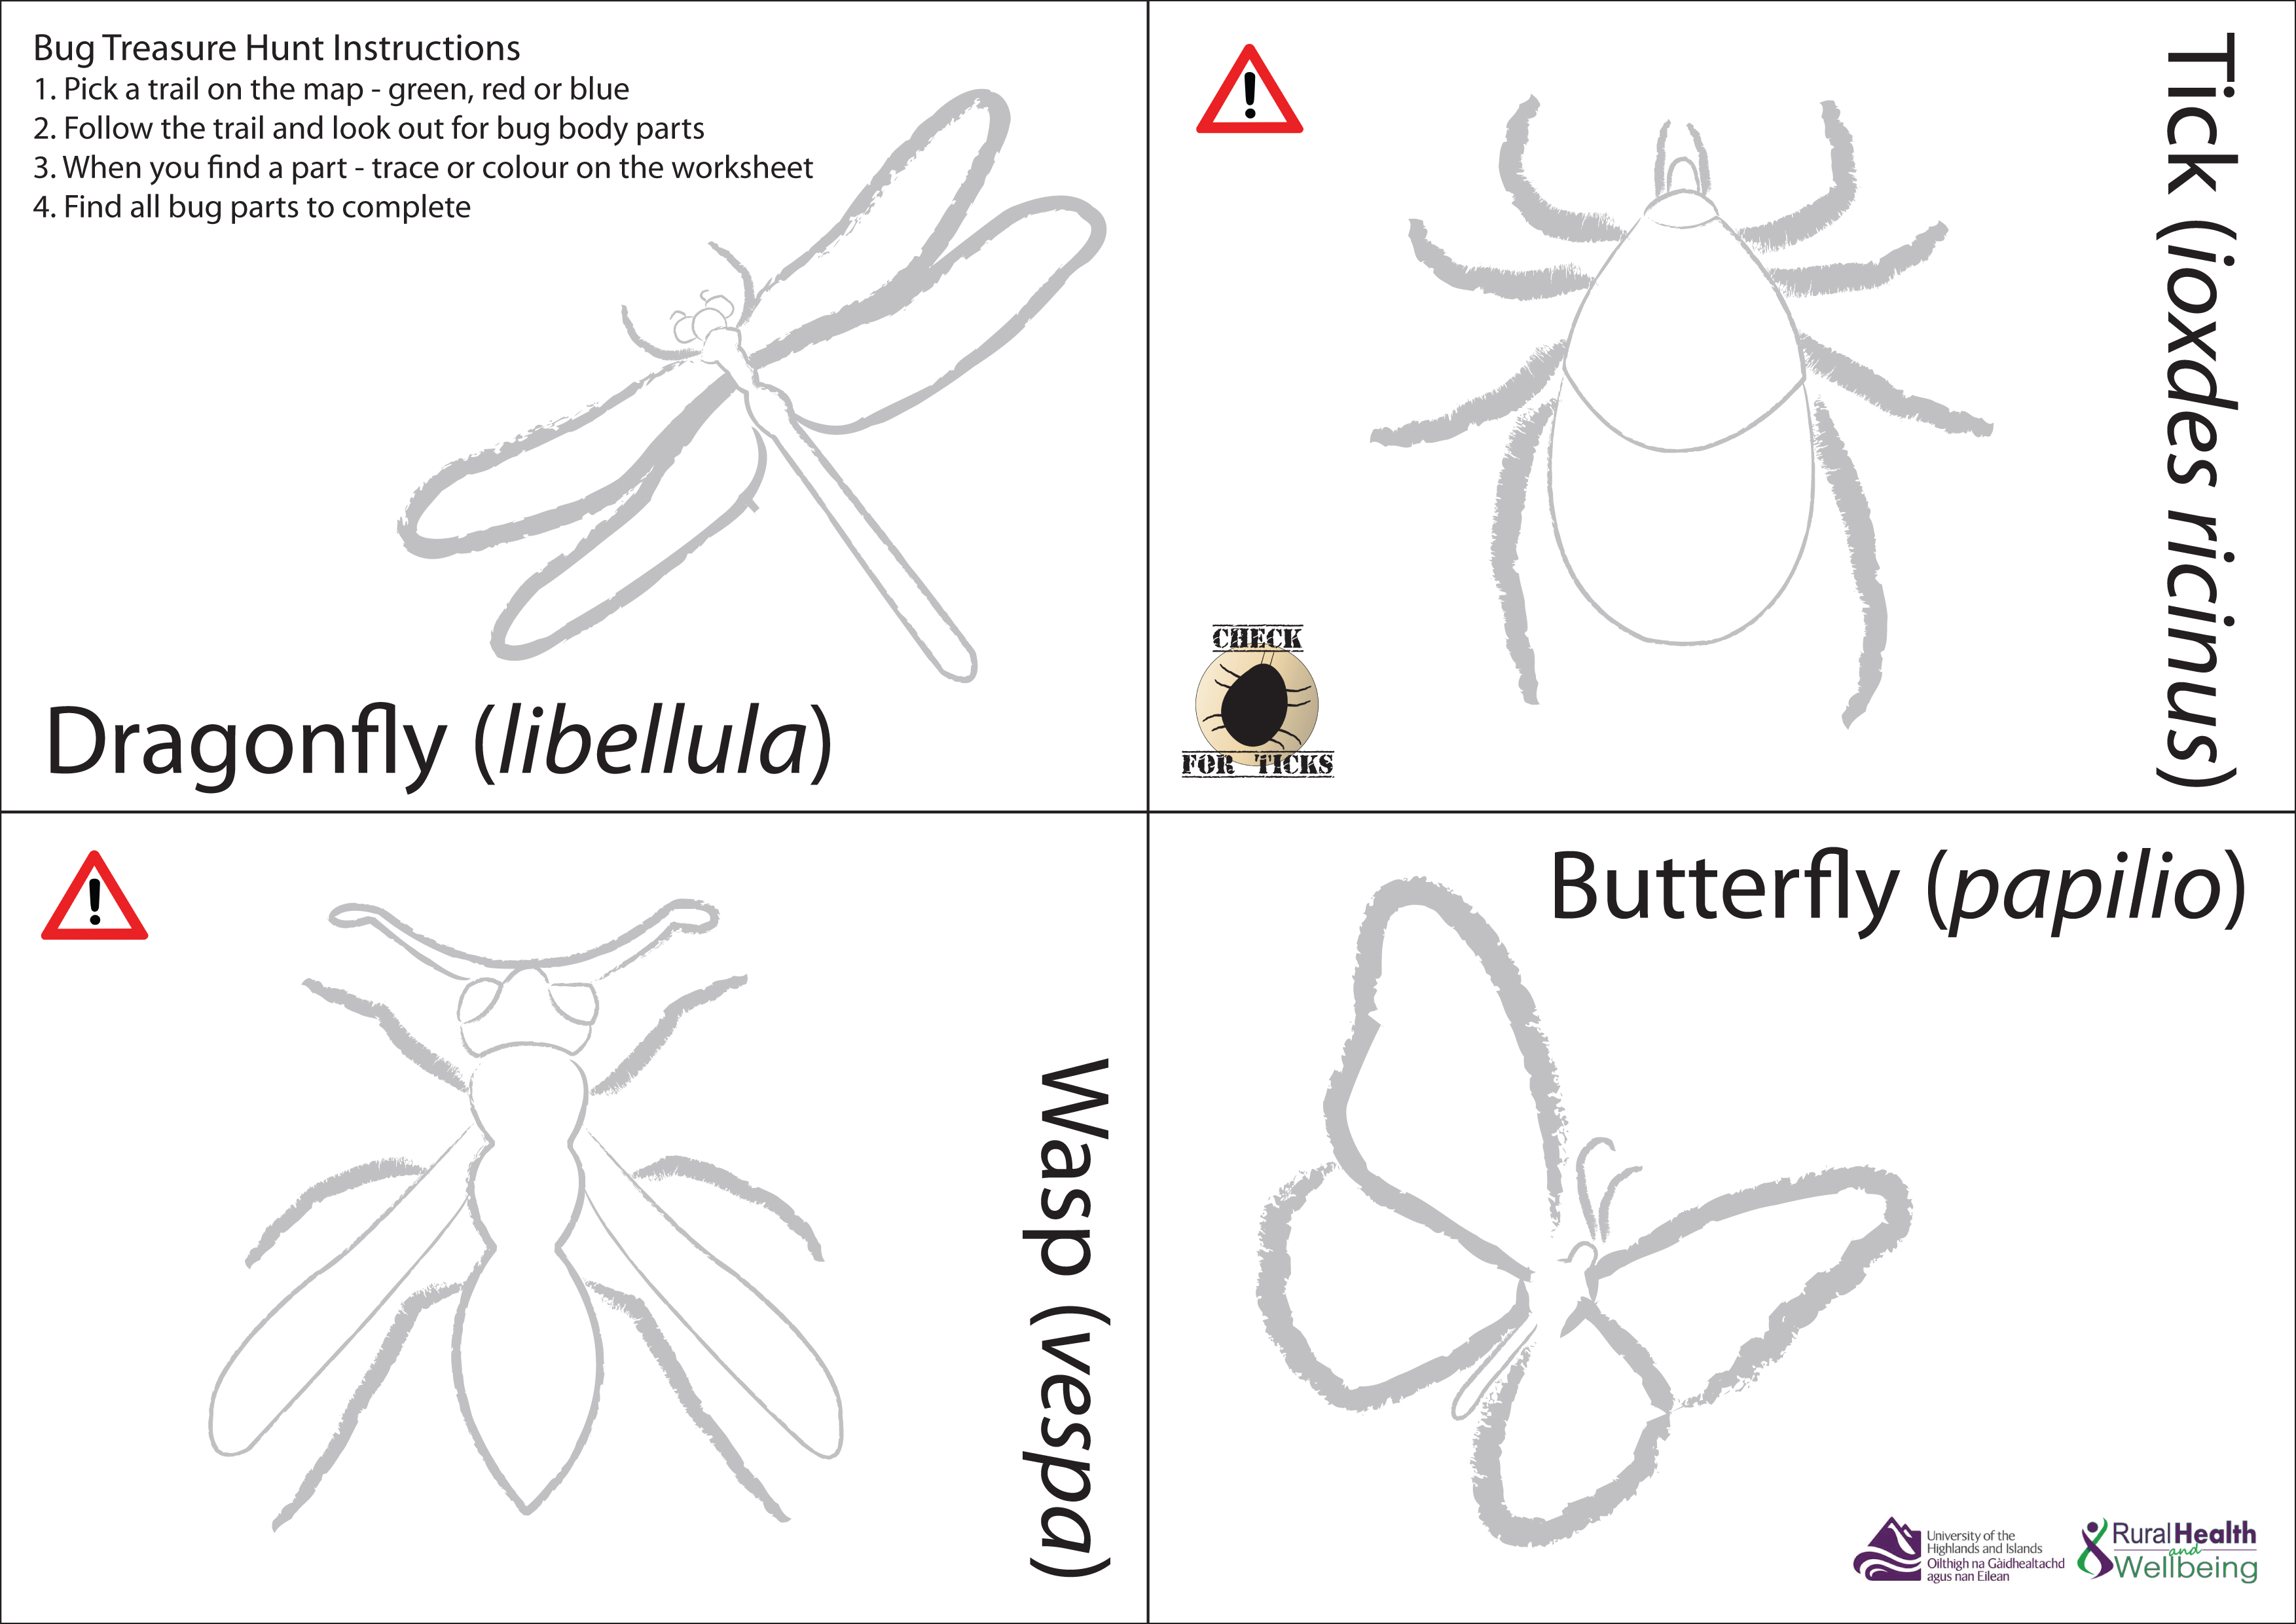 Bug Treasure Hunt Worksheet Check For Ticks